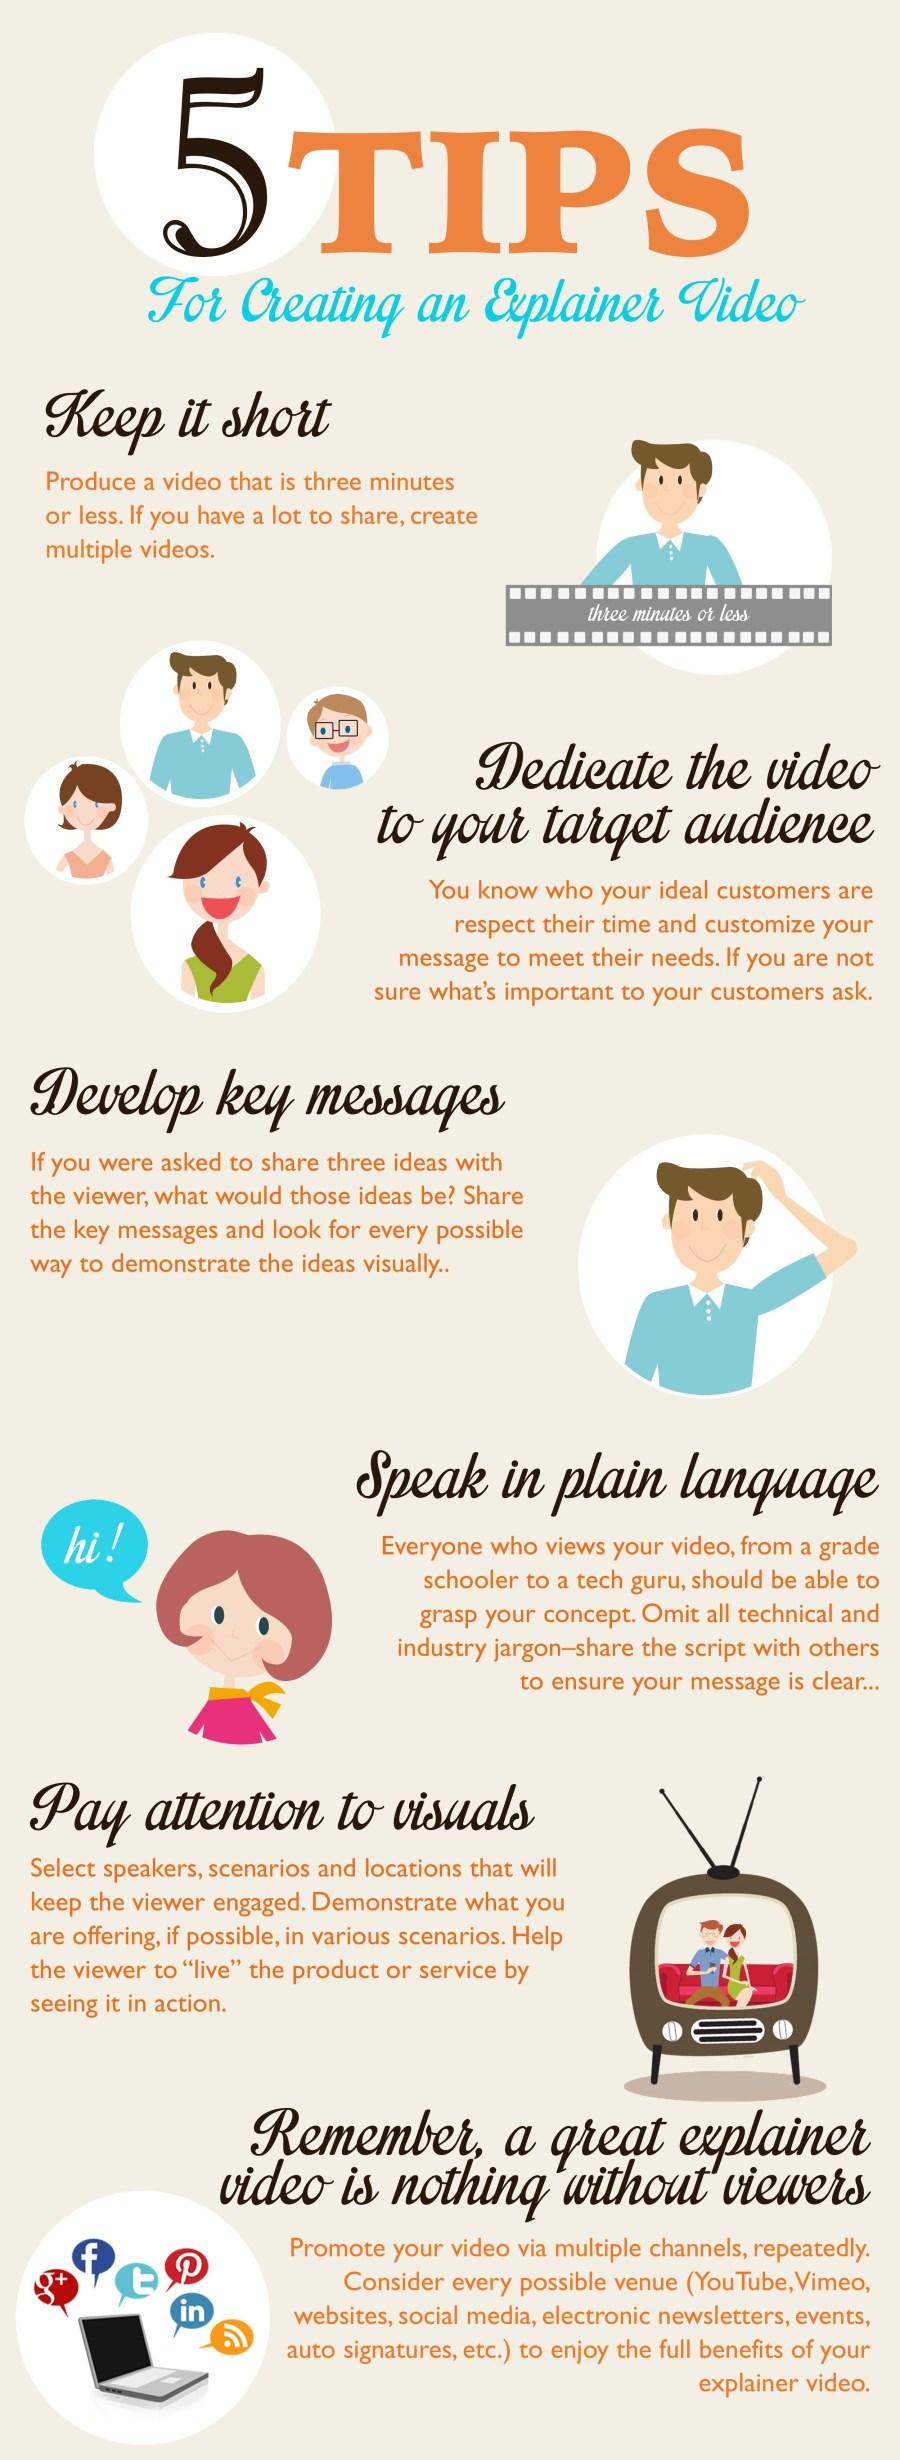 5-tips-for-creating-an-explainer-video-BlueFX